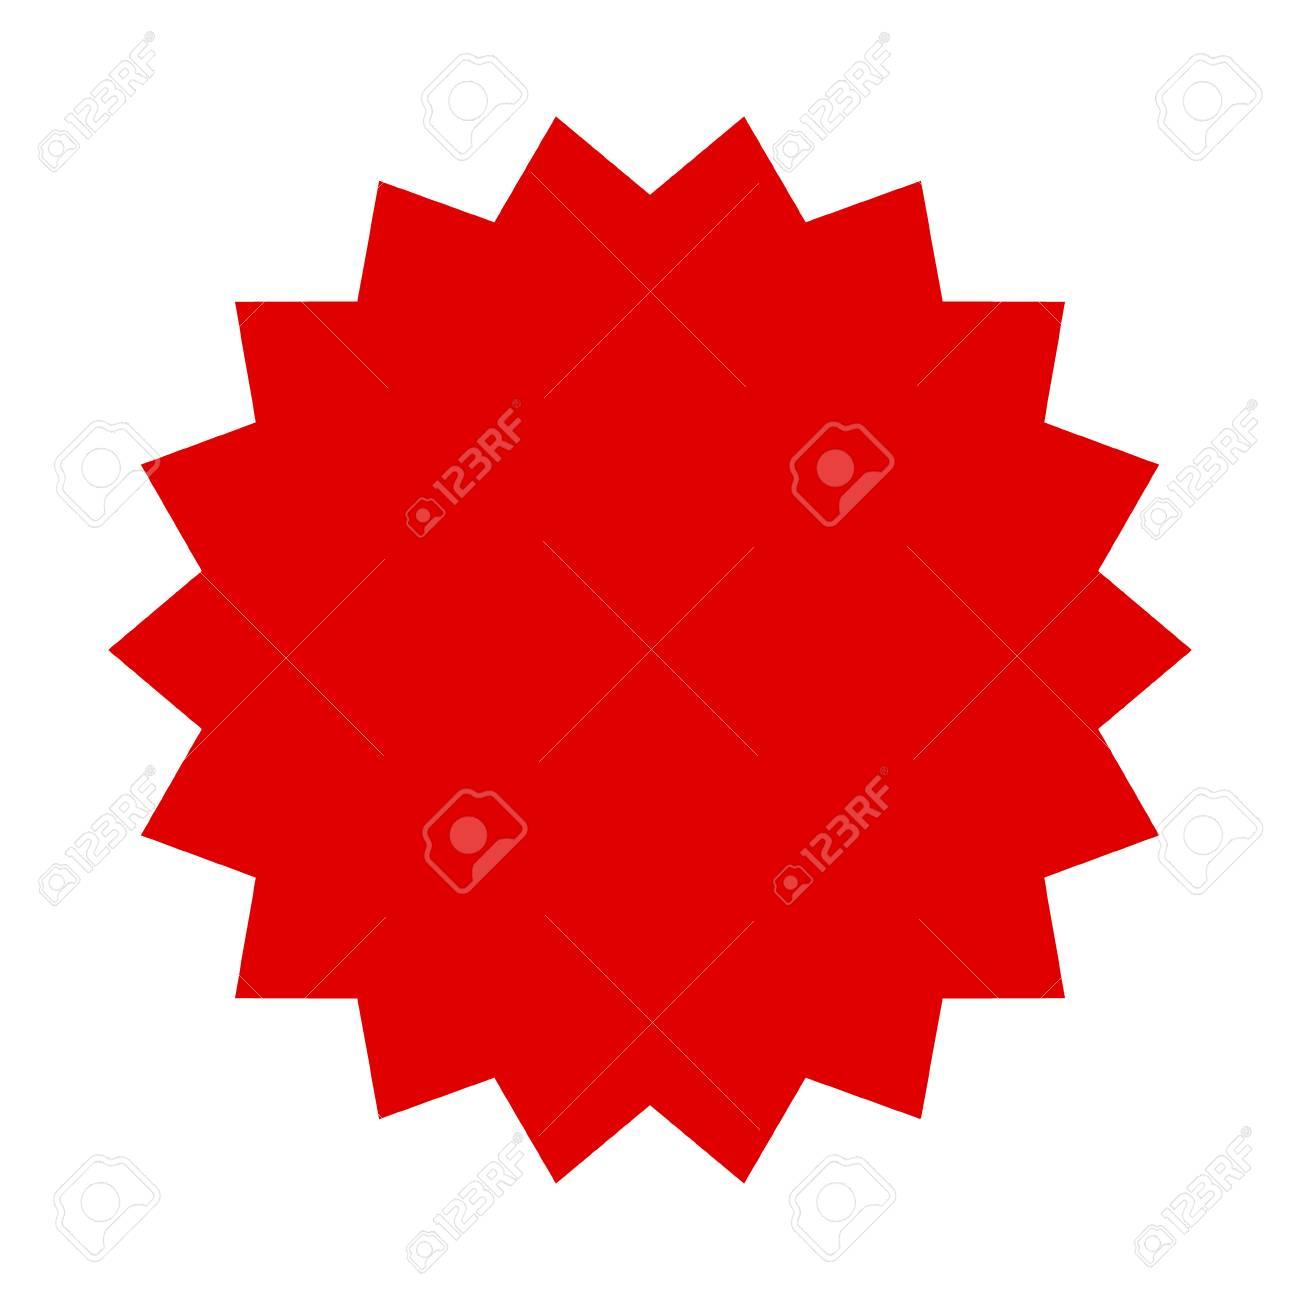 red starburst burst badge seal or label flat vector icon for rh 123rf com starburst vector art starburst vector free